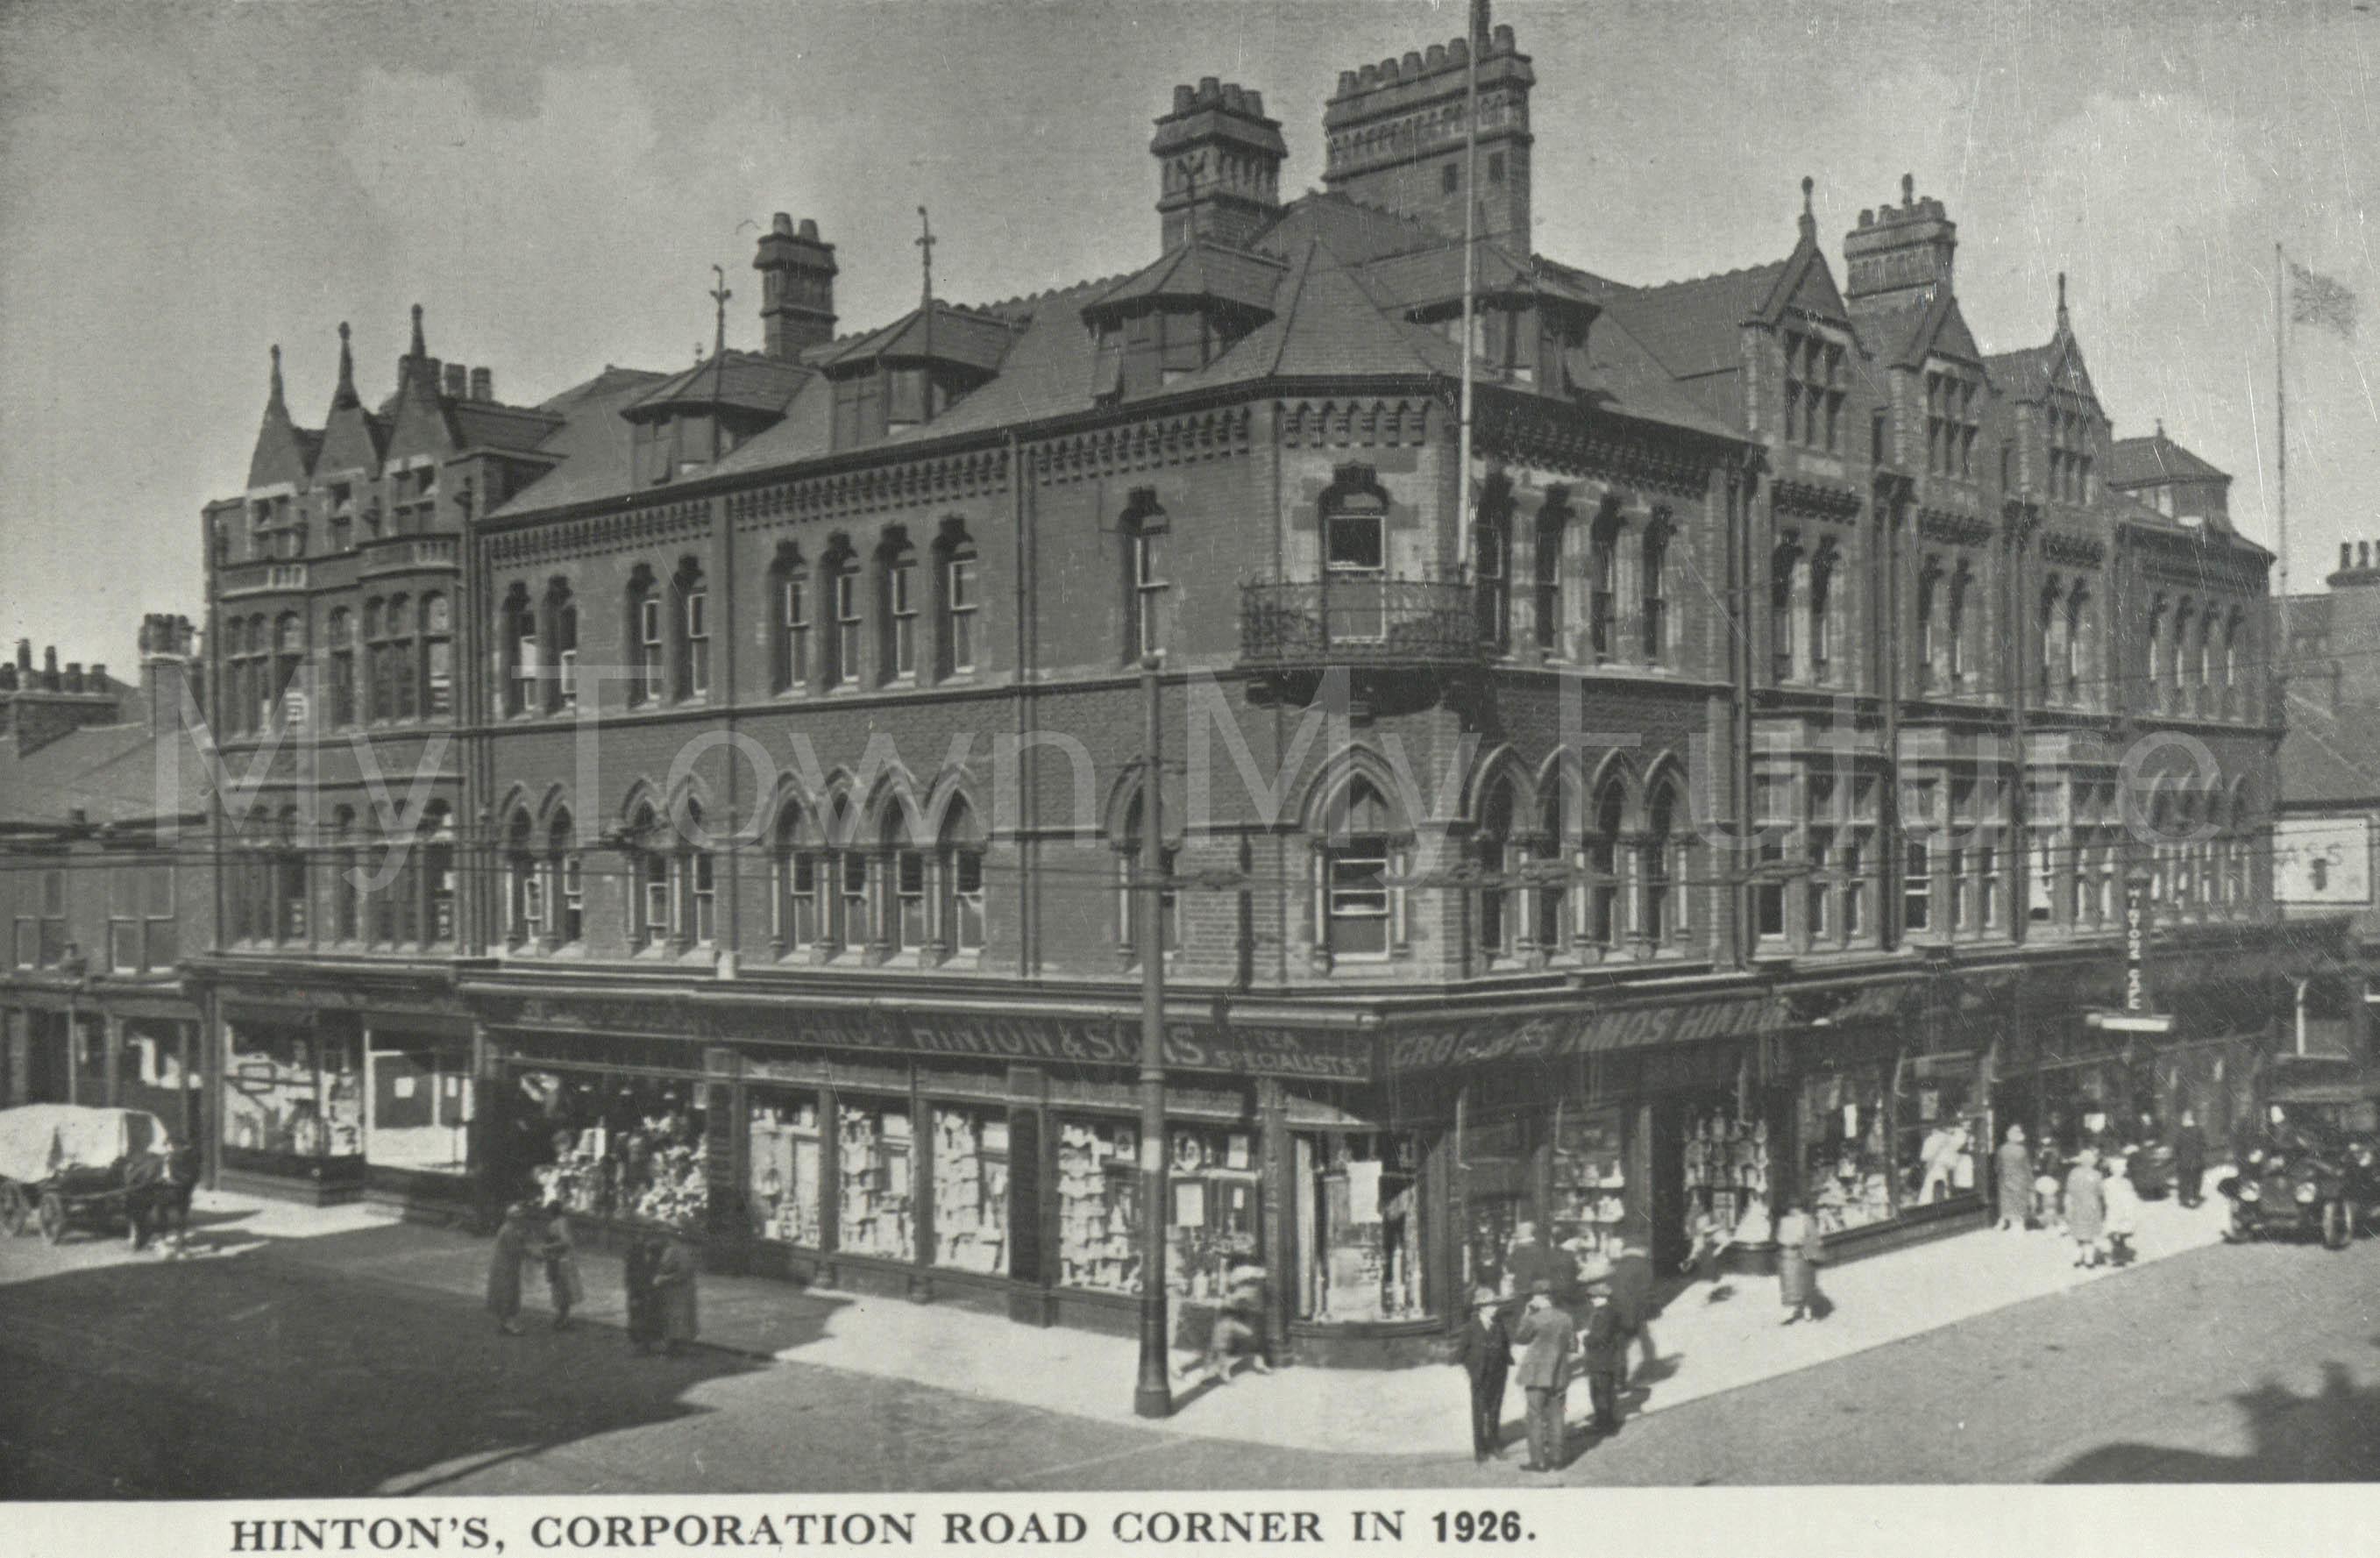 Hinton's, Corporation Road 1926